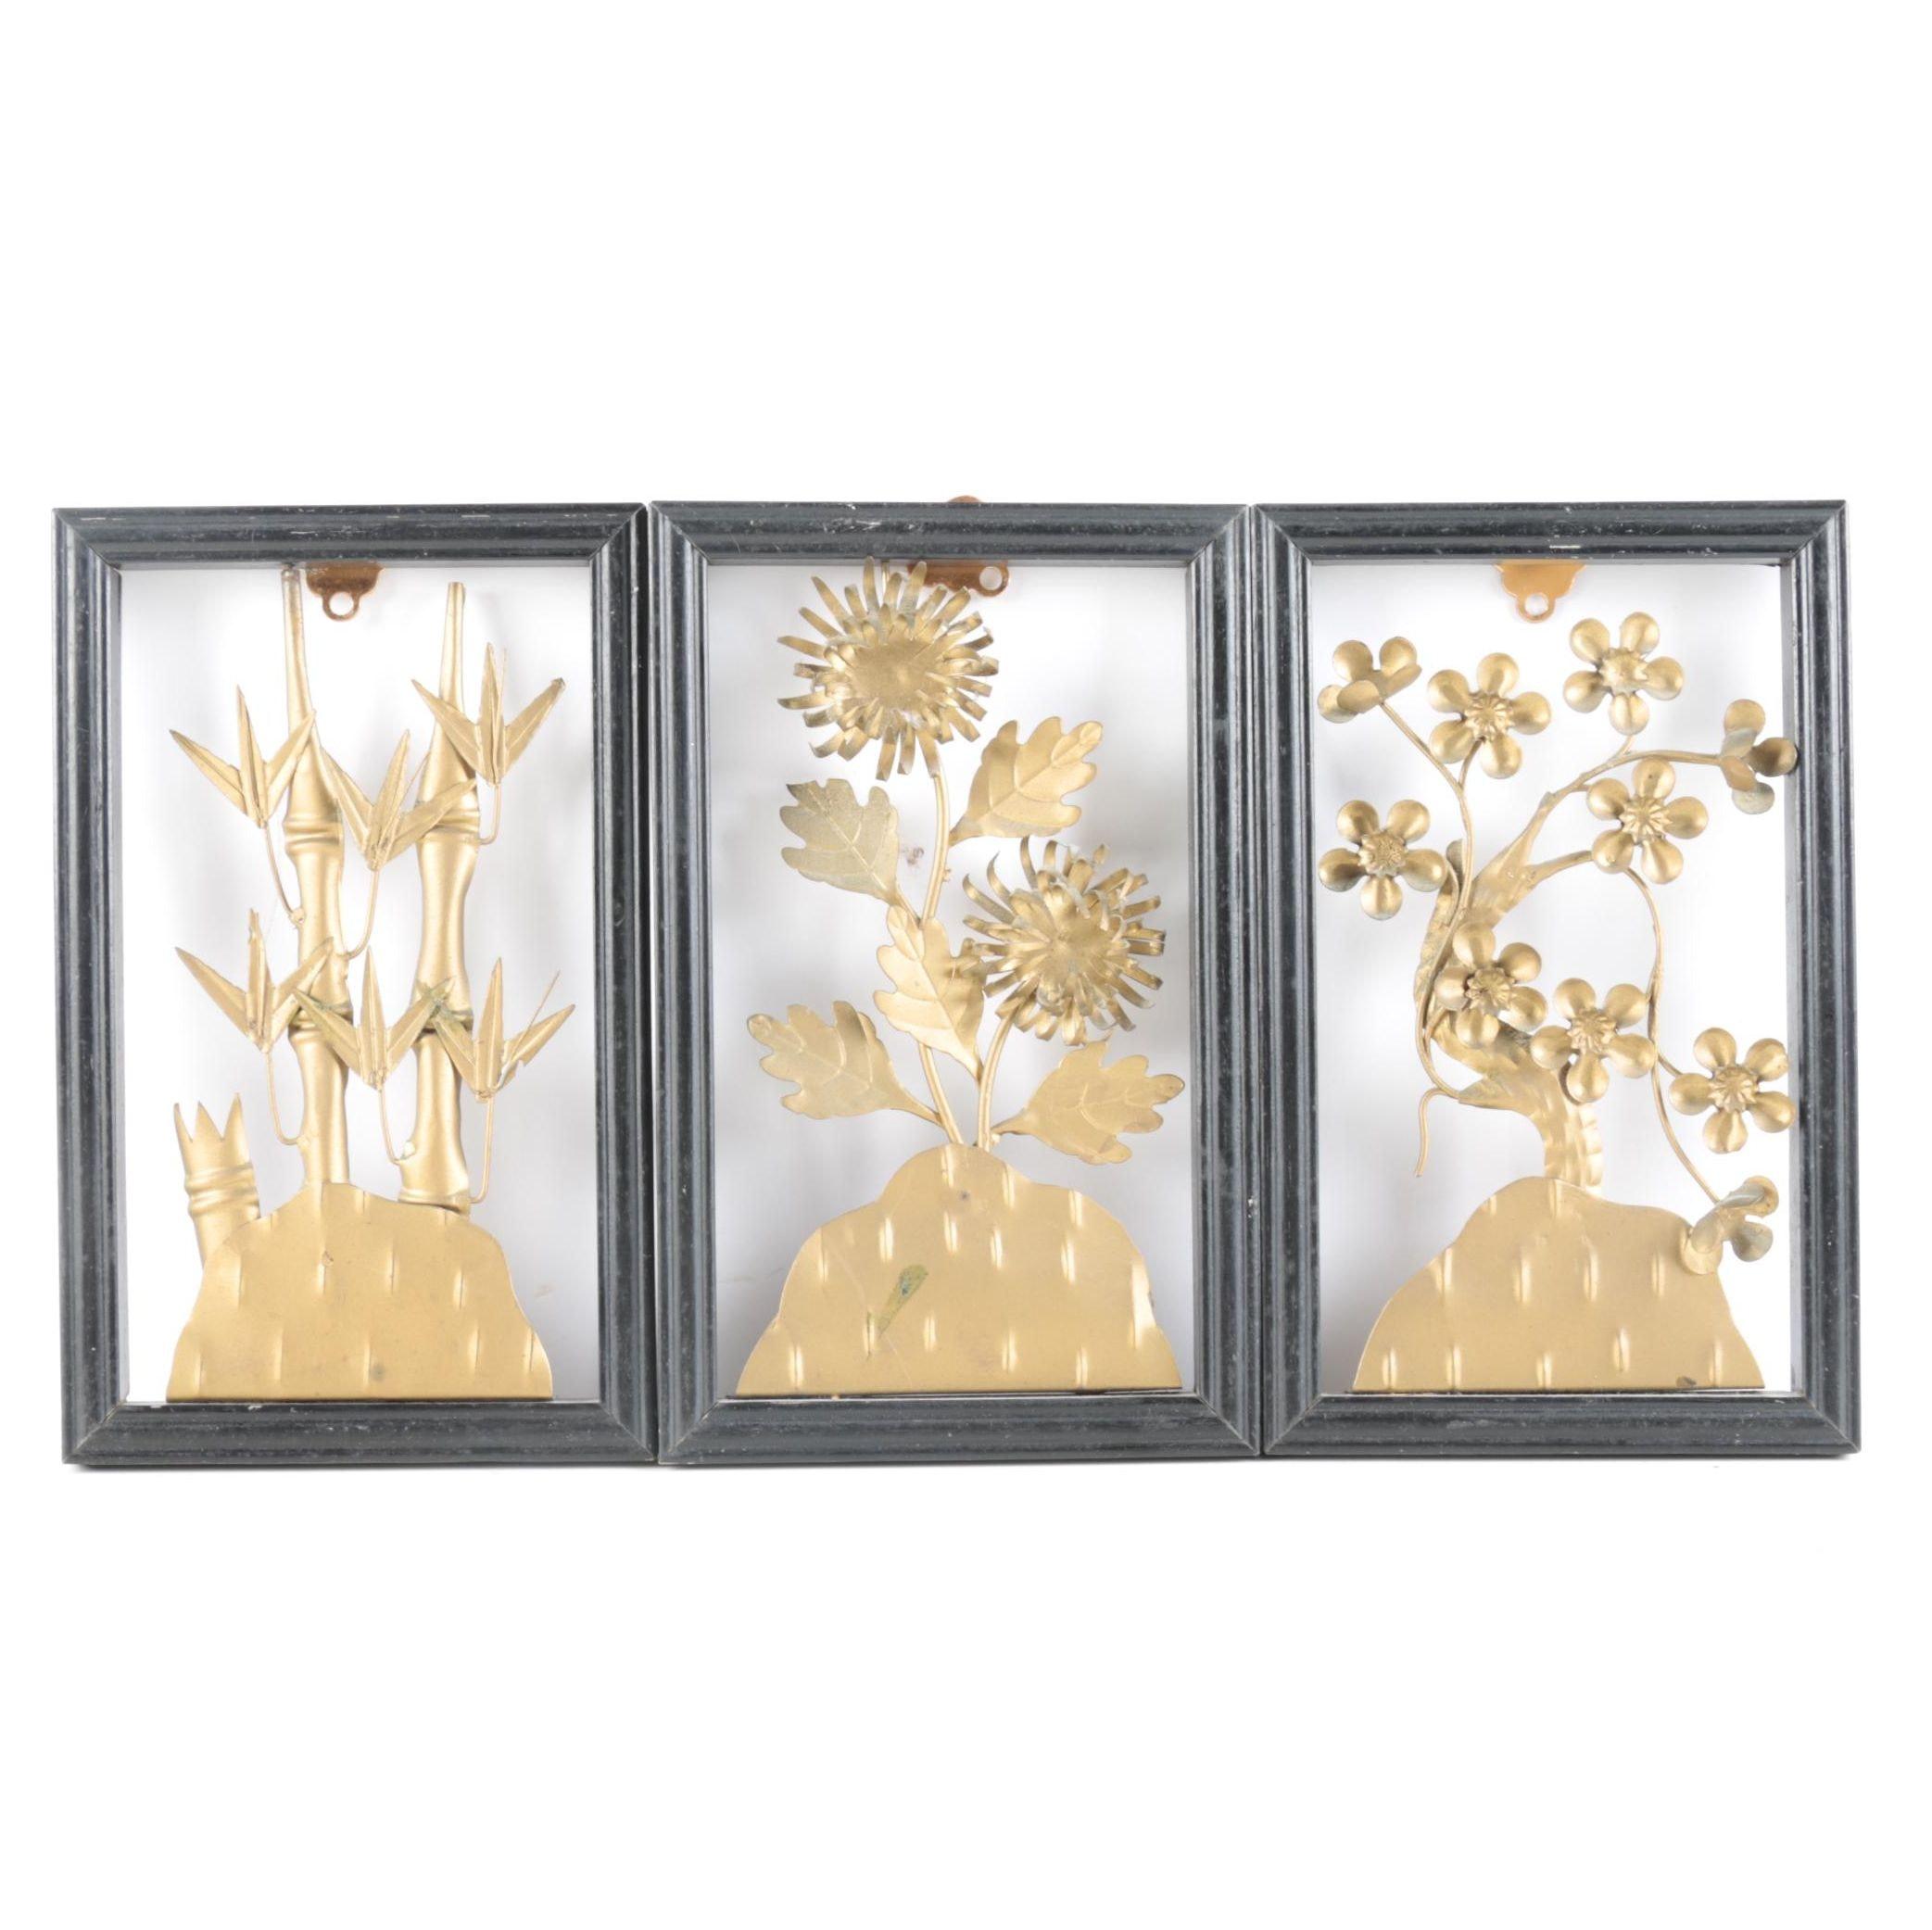 Set of Framed Chinese Cut Metal Art